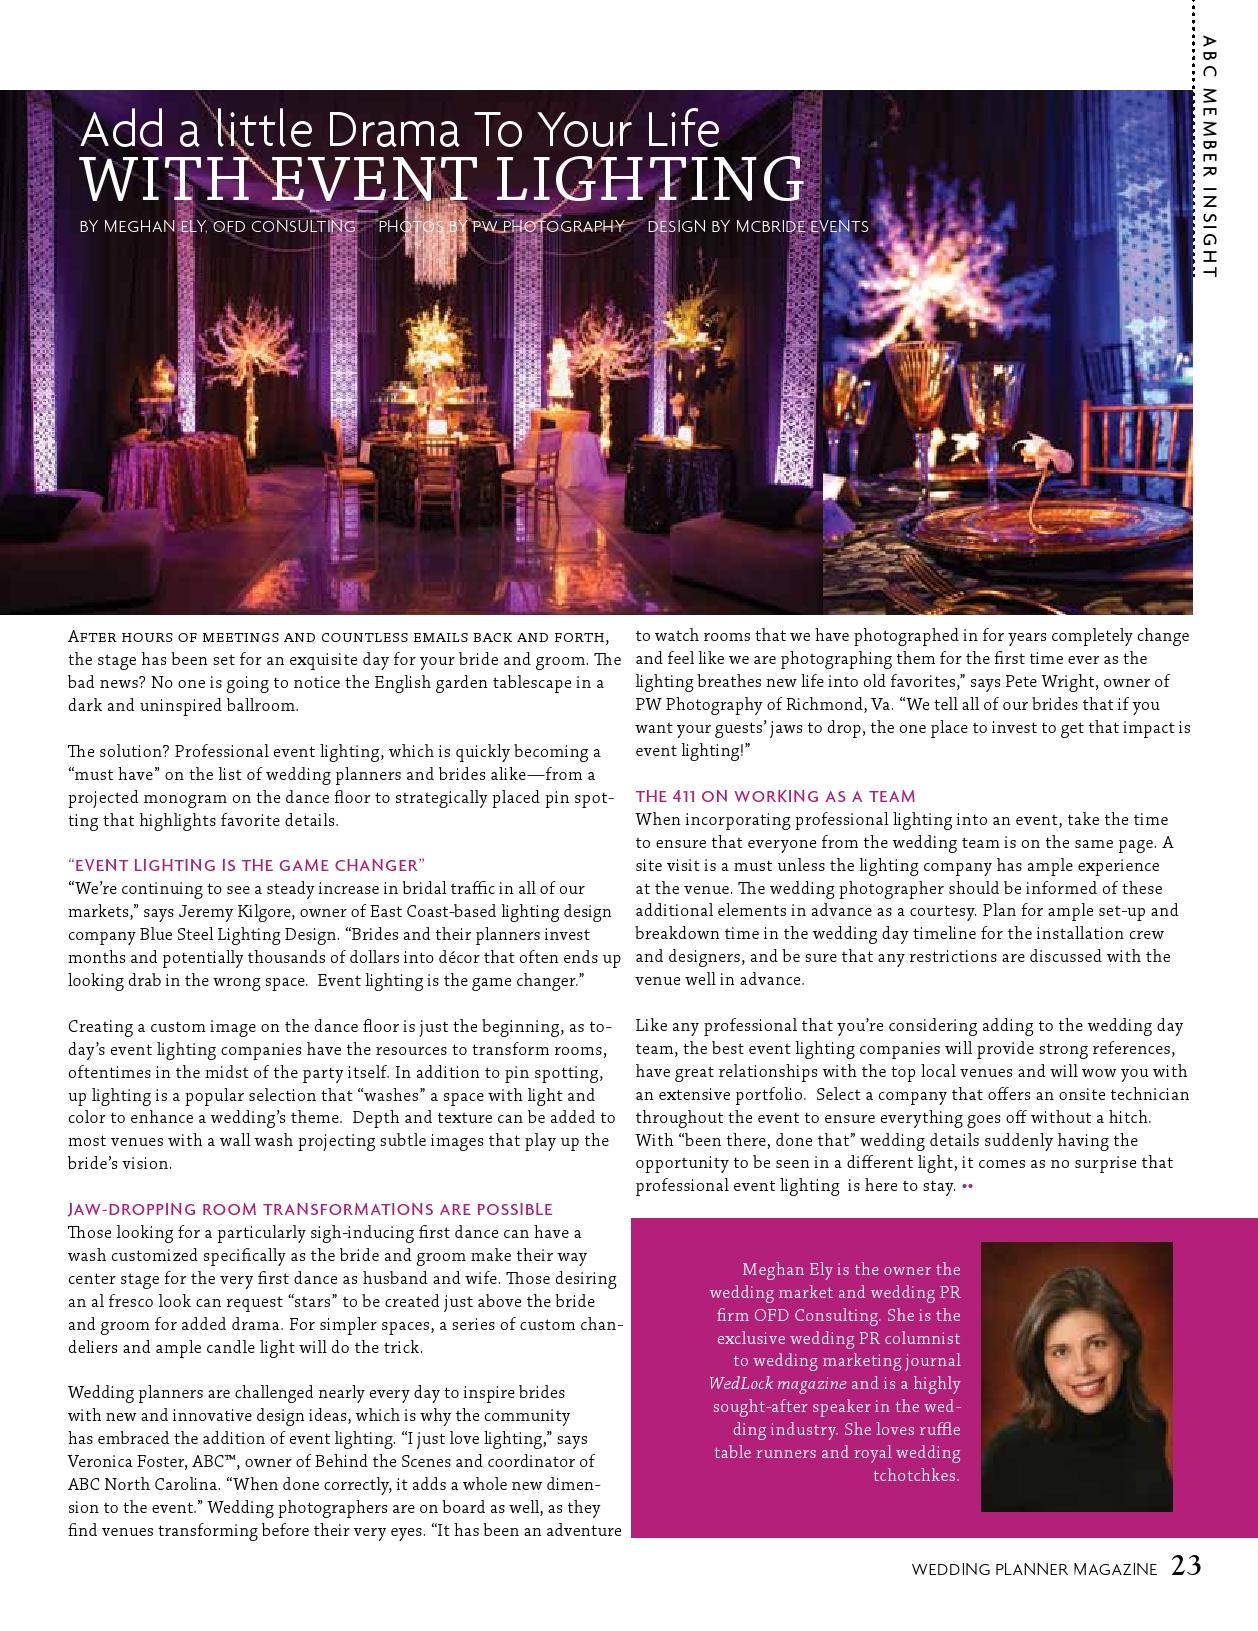 WP Mag Vol 2 Issue 1 Pg 23.jpg